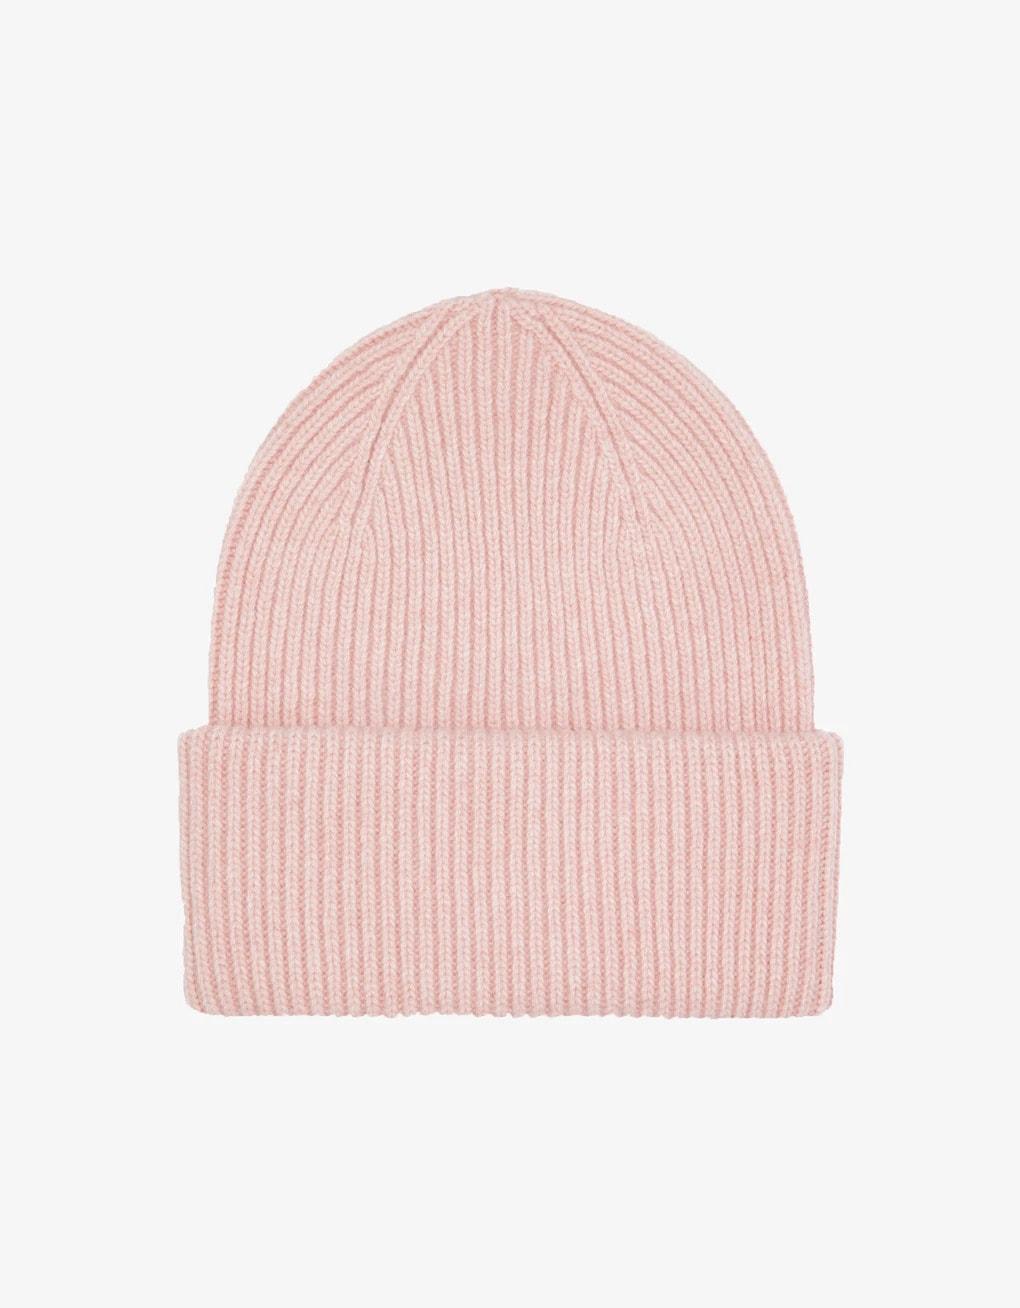 Merino wool hat – faded pink